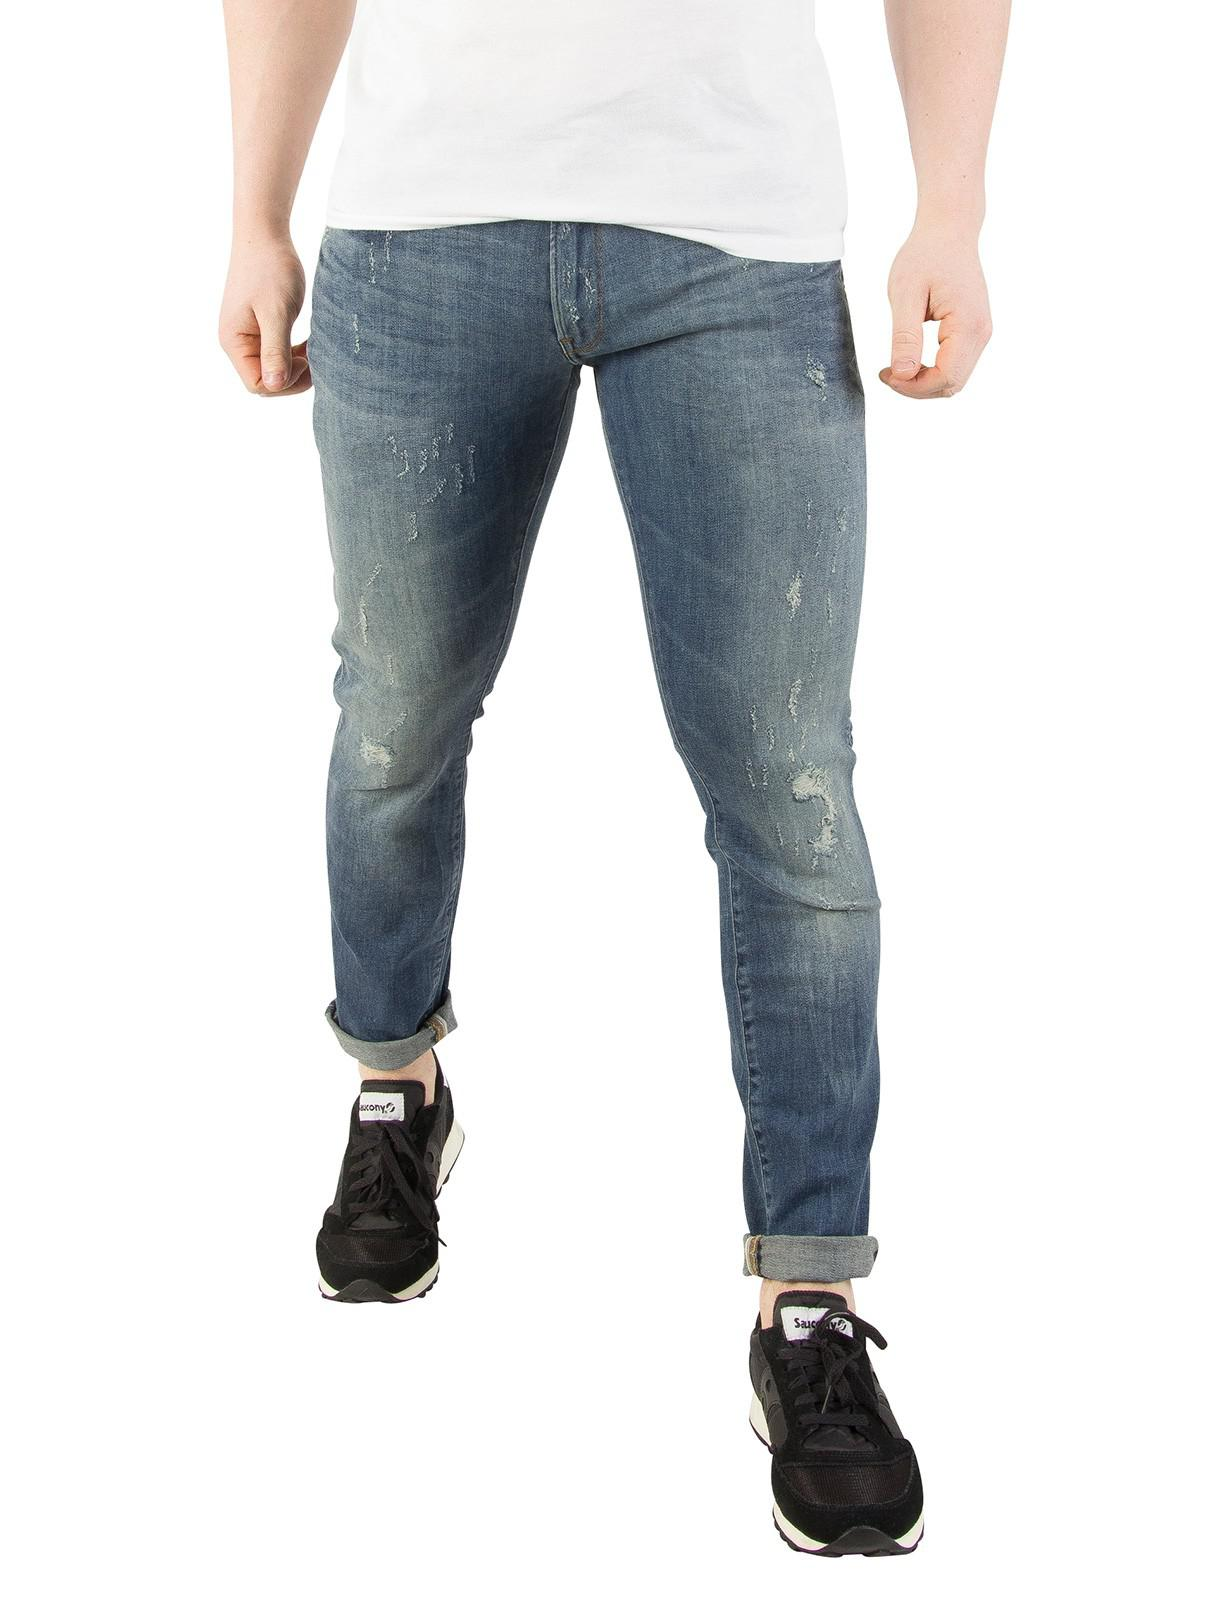 00424e0aaa7 G-Star RAW Vintage Medium Aged 3301 Deconstructed Super Slim Jeans ...